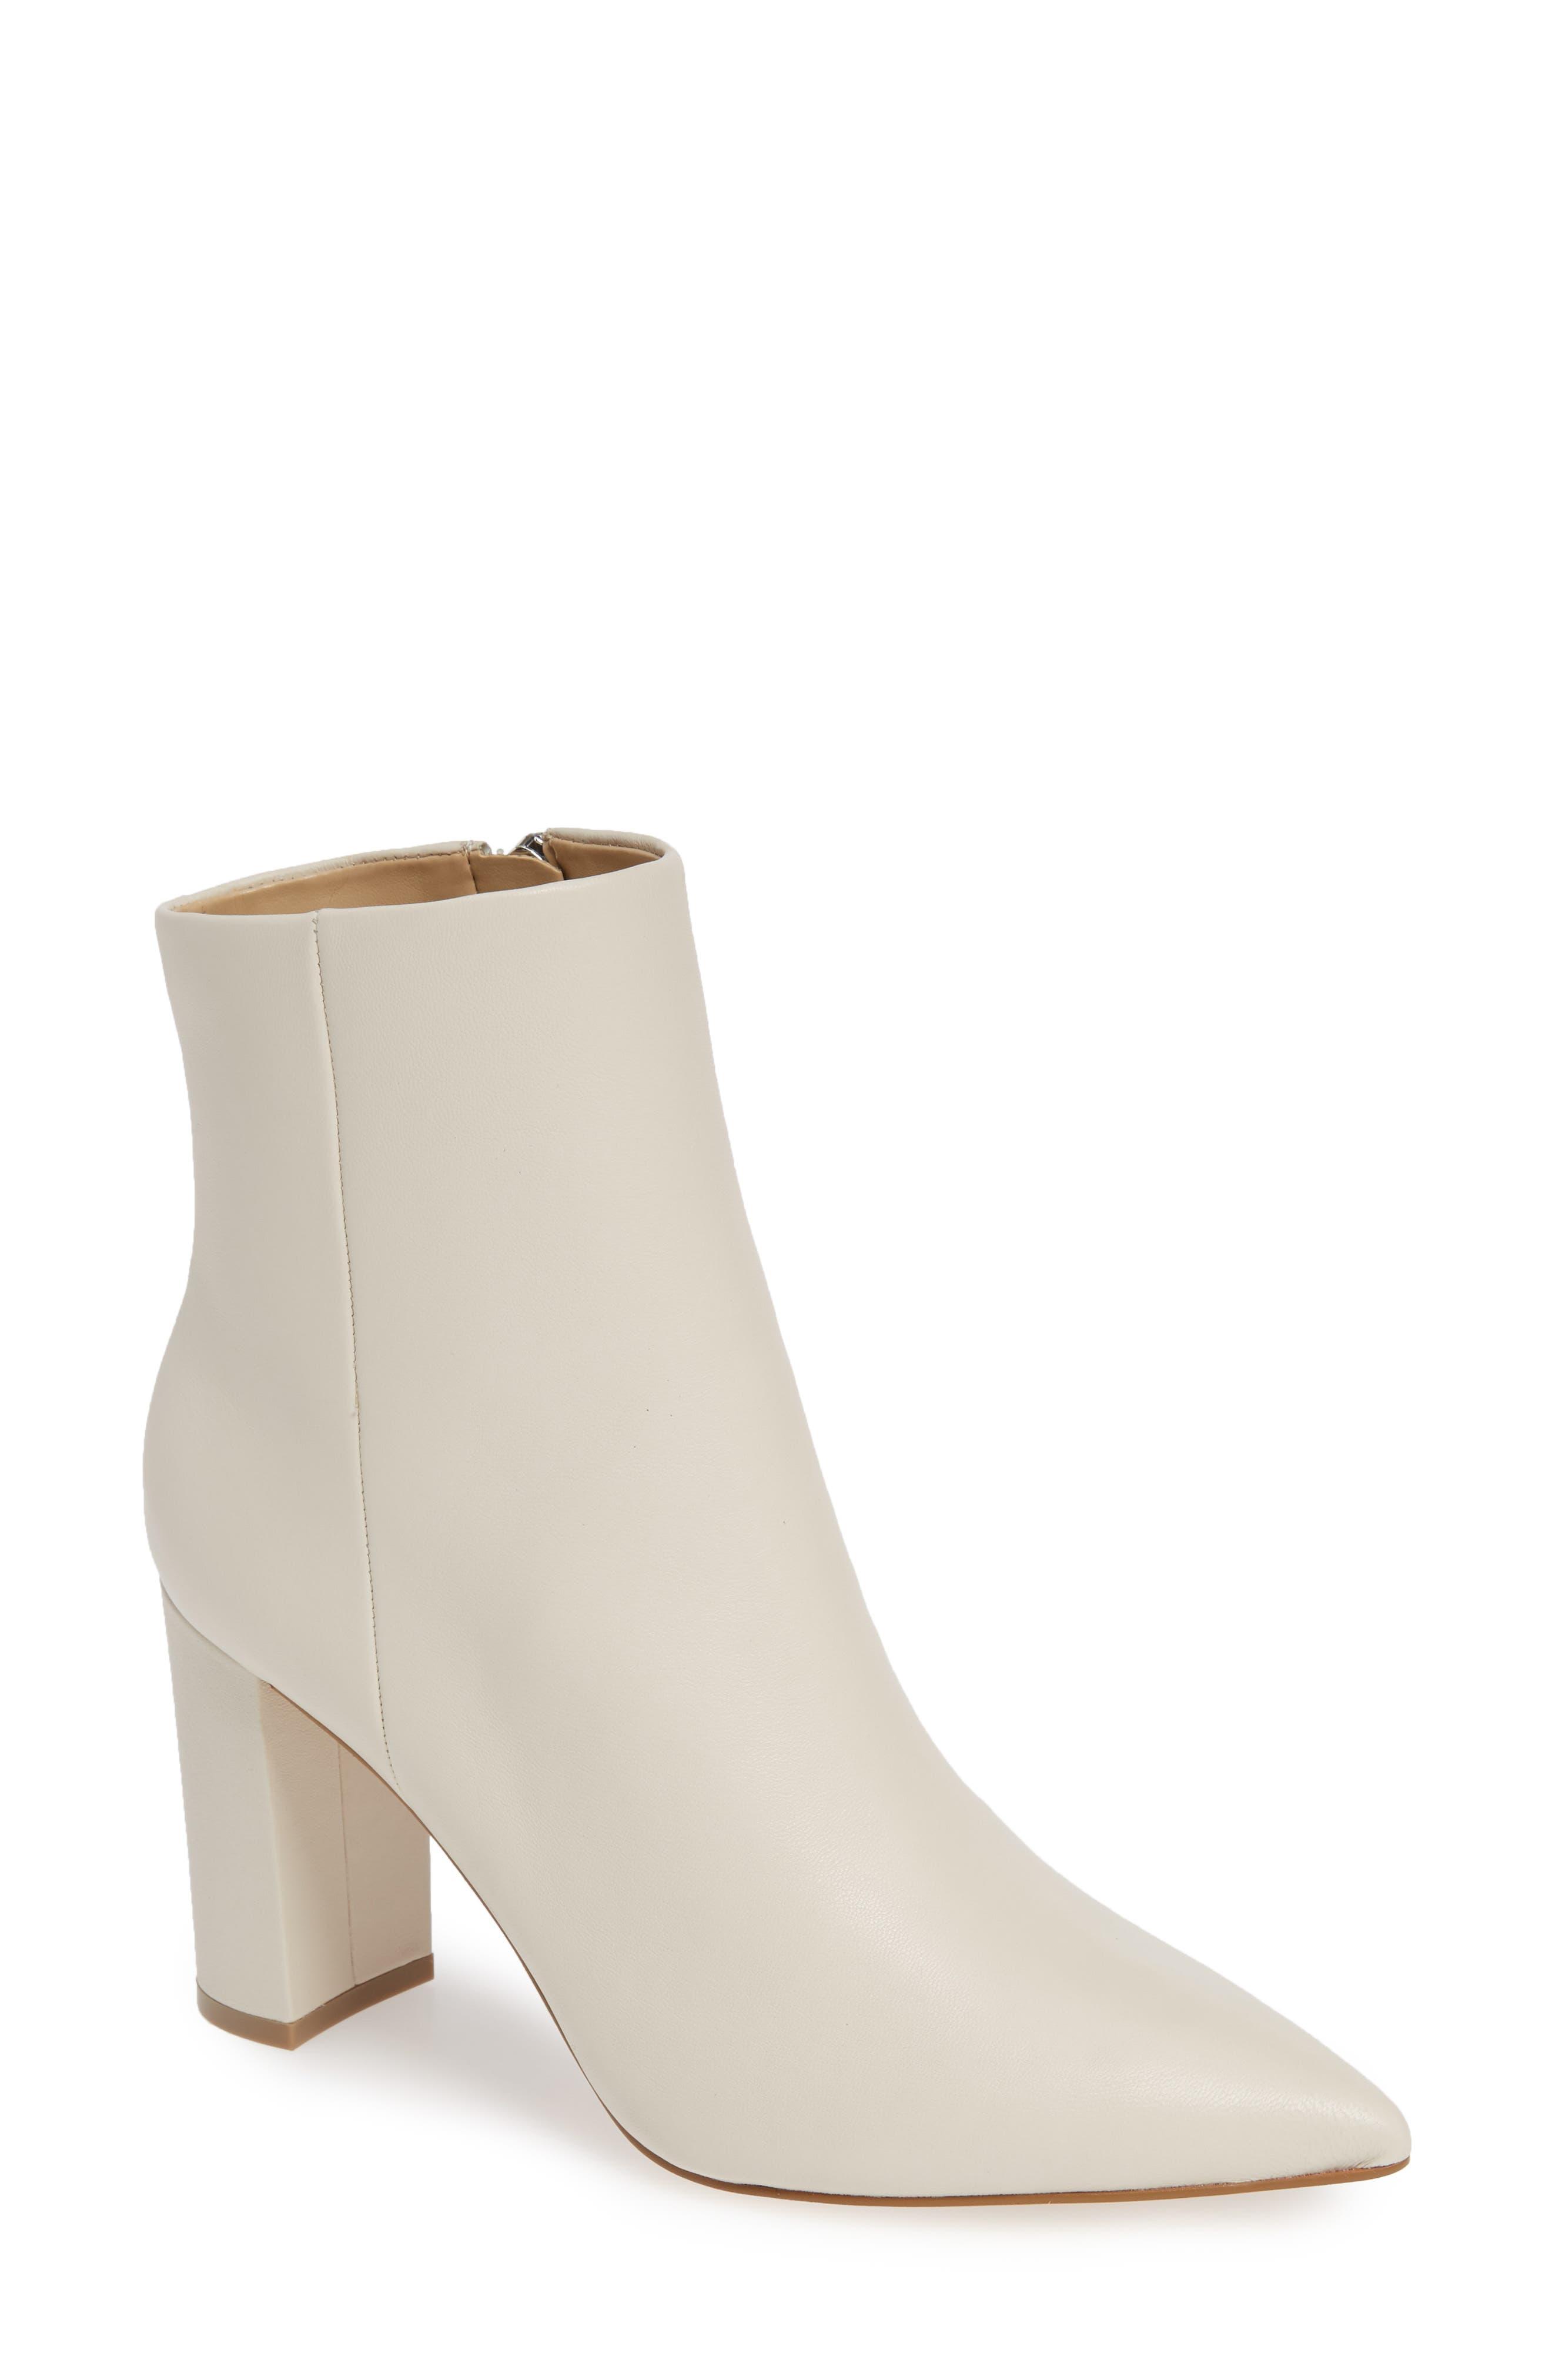 Marc Fisher Ltd. Ulani Pointy Toe Bootie, White